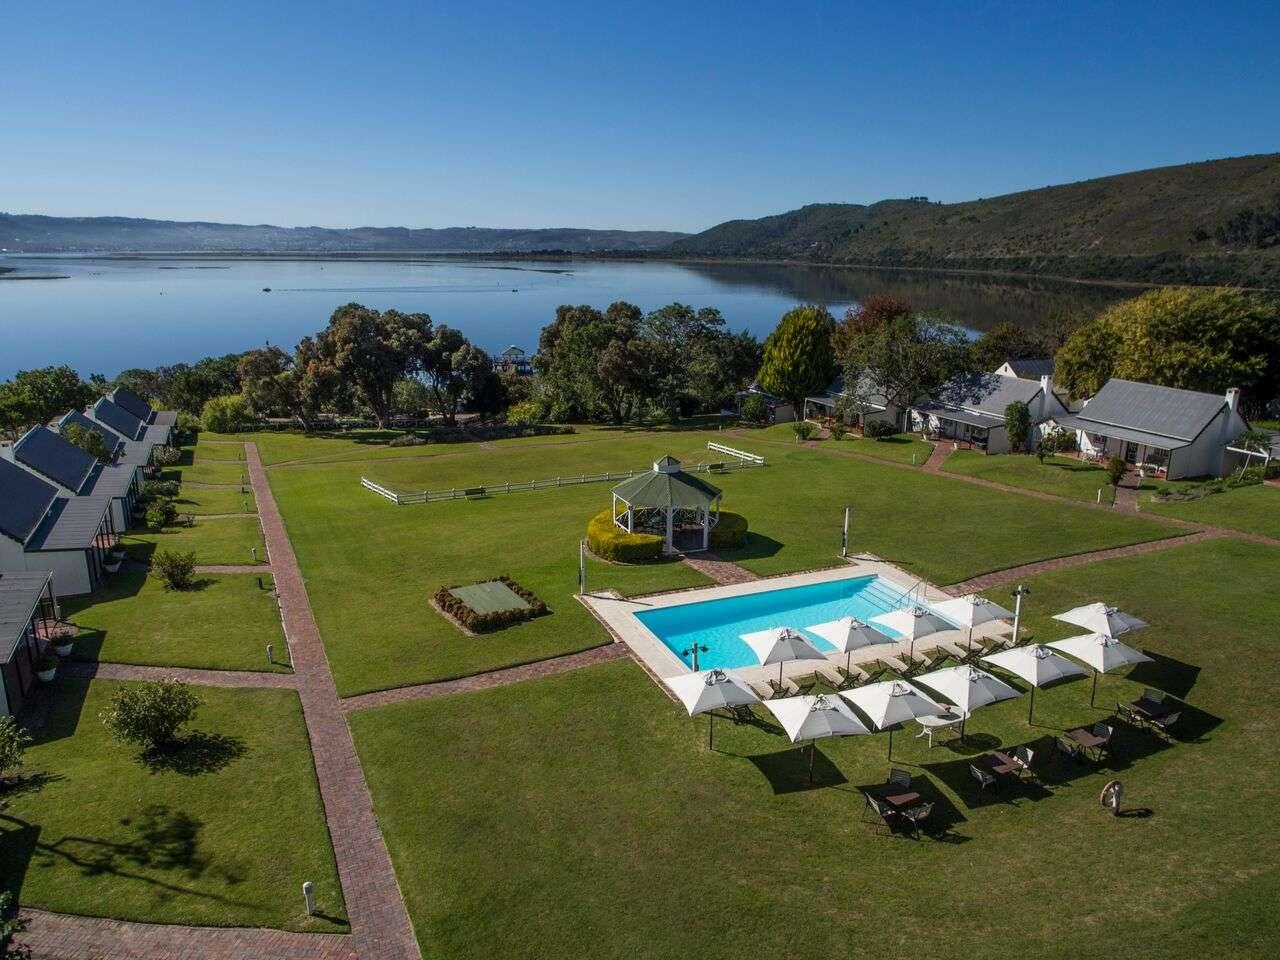 Belvidere Manor Hotel Knysna South Africa